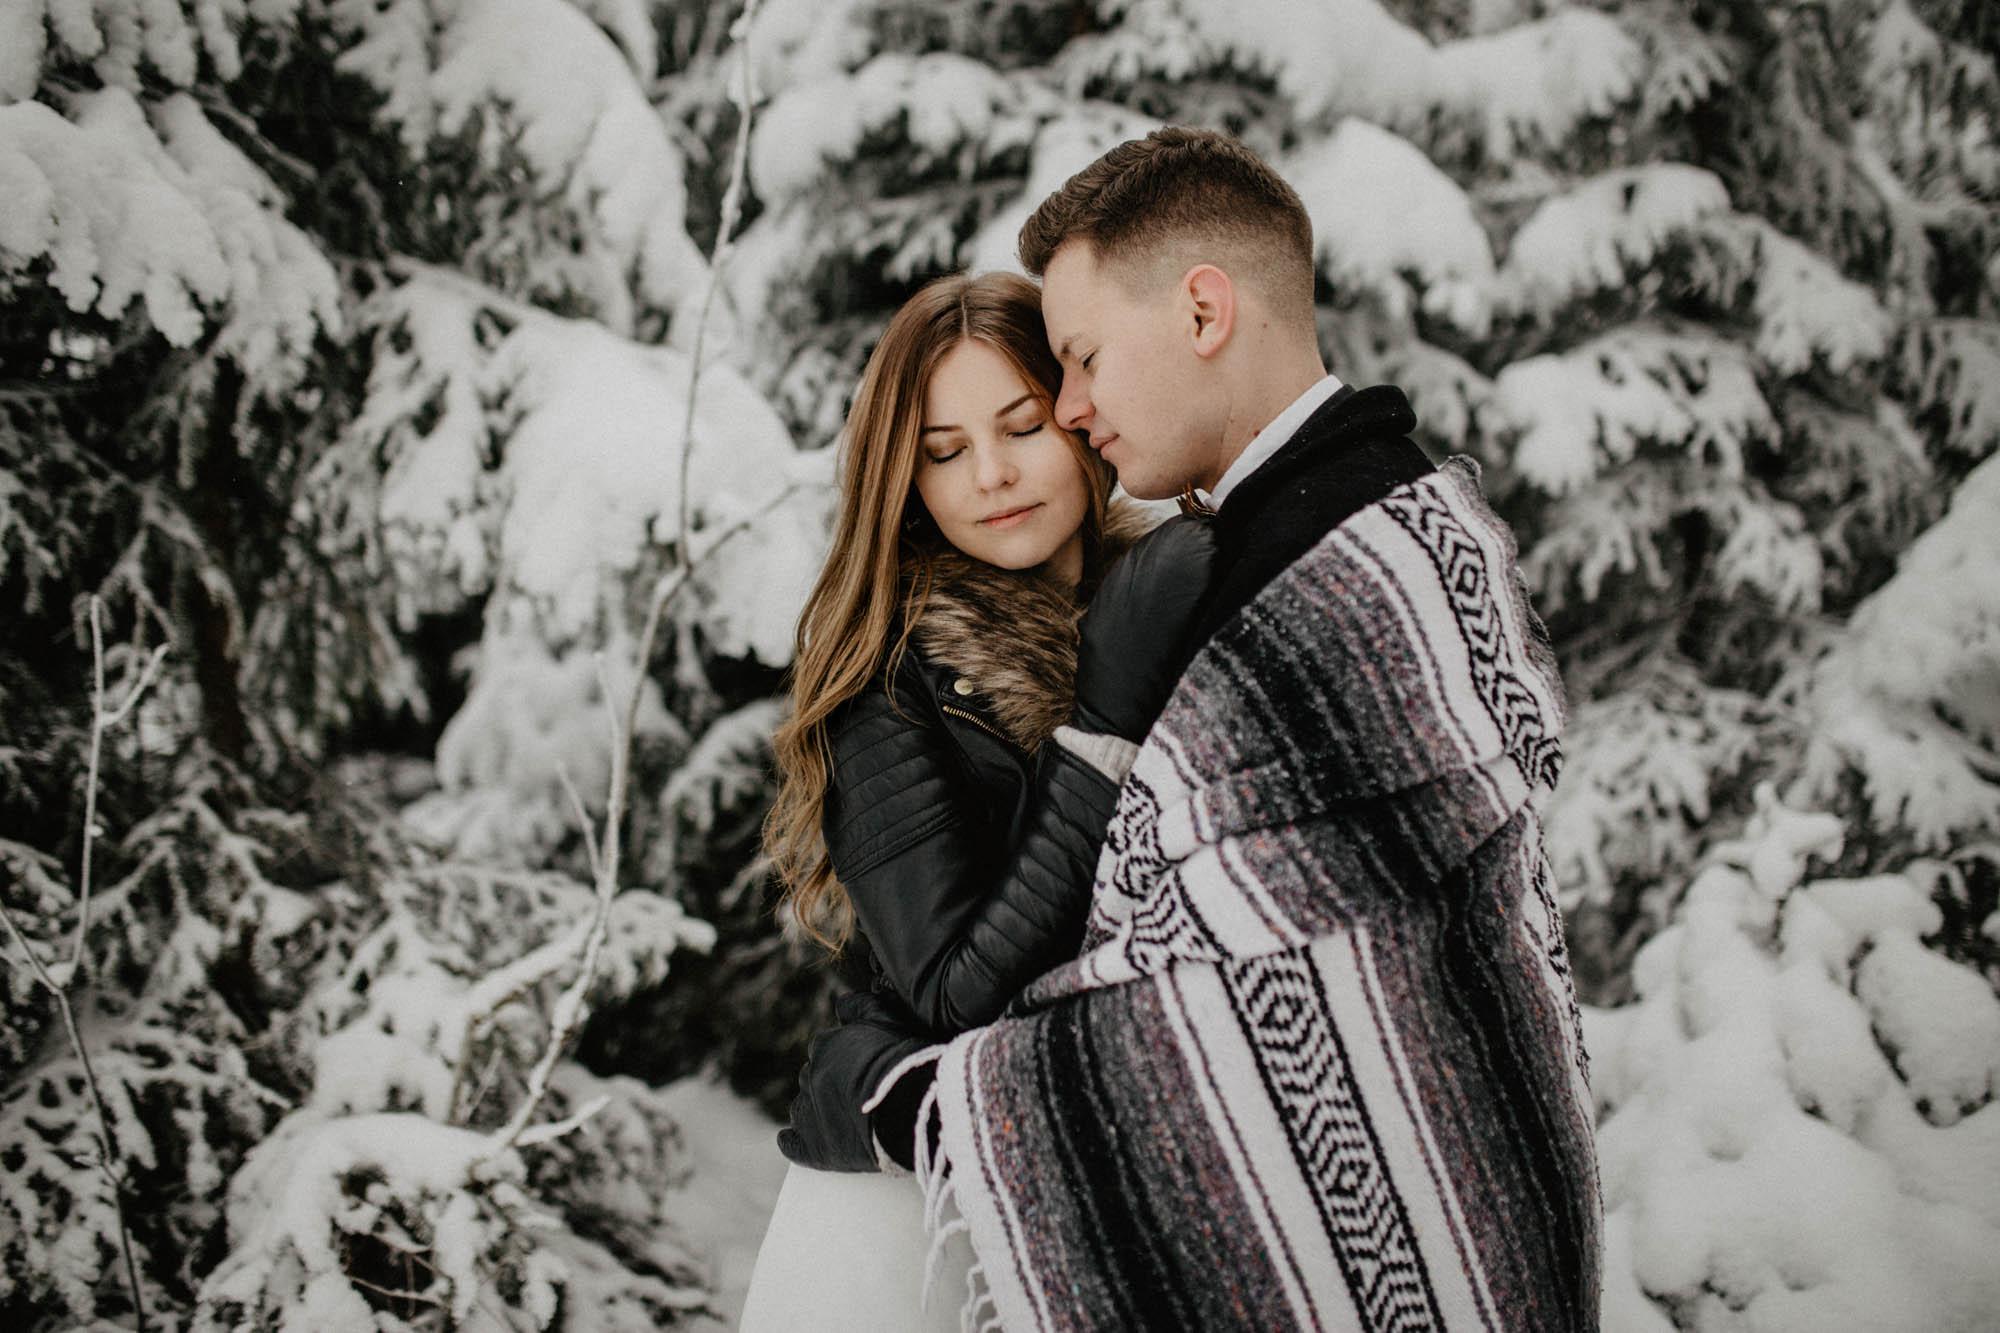 ashley_schulman_photography-winter_wedding_tampere-33.jpg